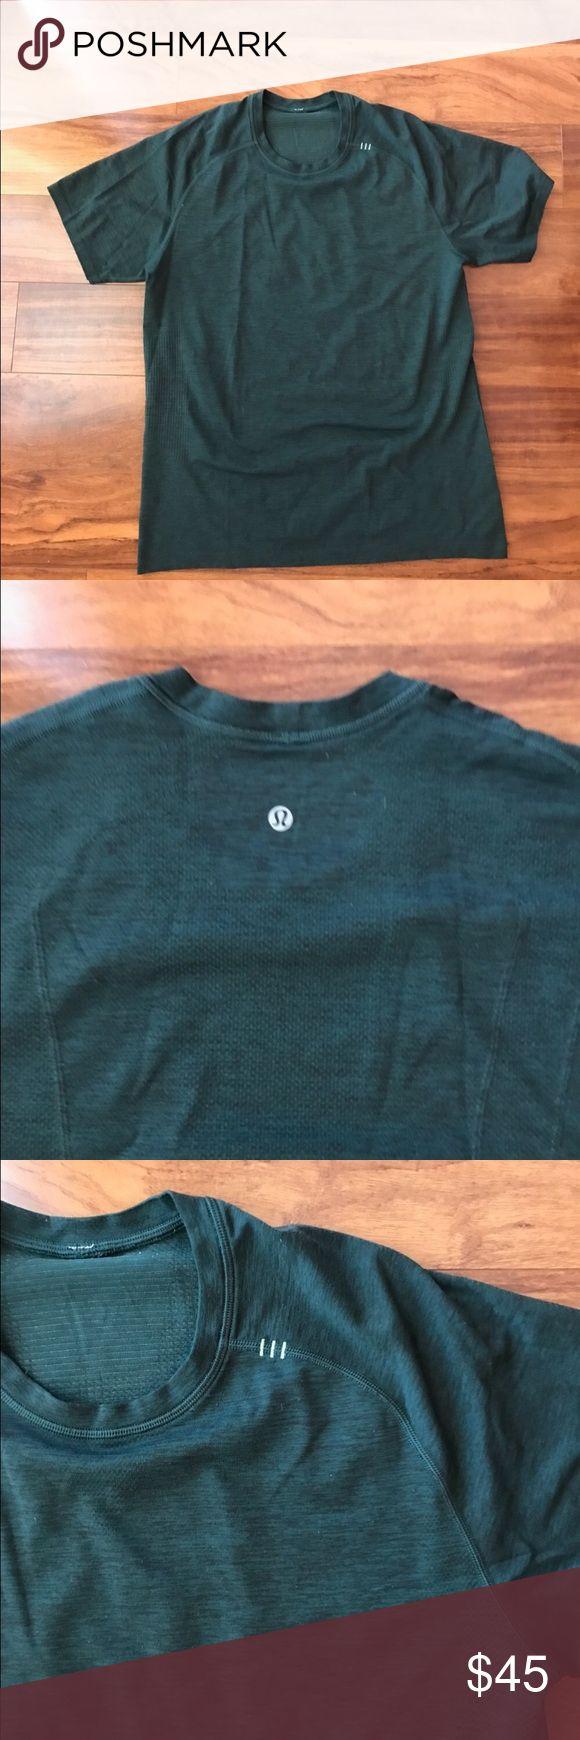 Lululemon Metal Vent T-Shirt Large men's lululemon Metal Vent shirt. Worn only a couple of times. In great condition lululemon athletica Shirts Tees - Short Sleeve